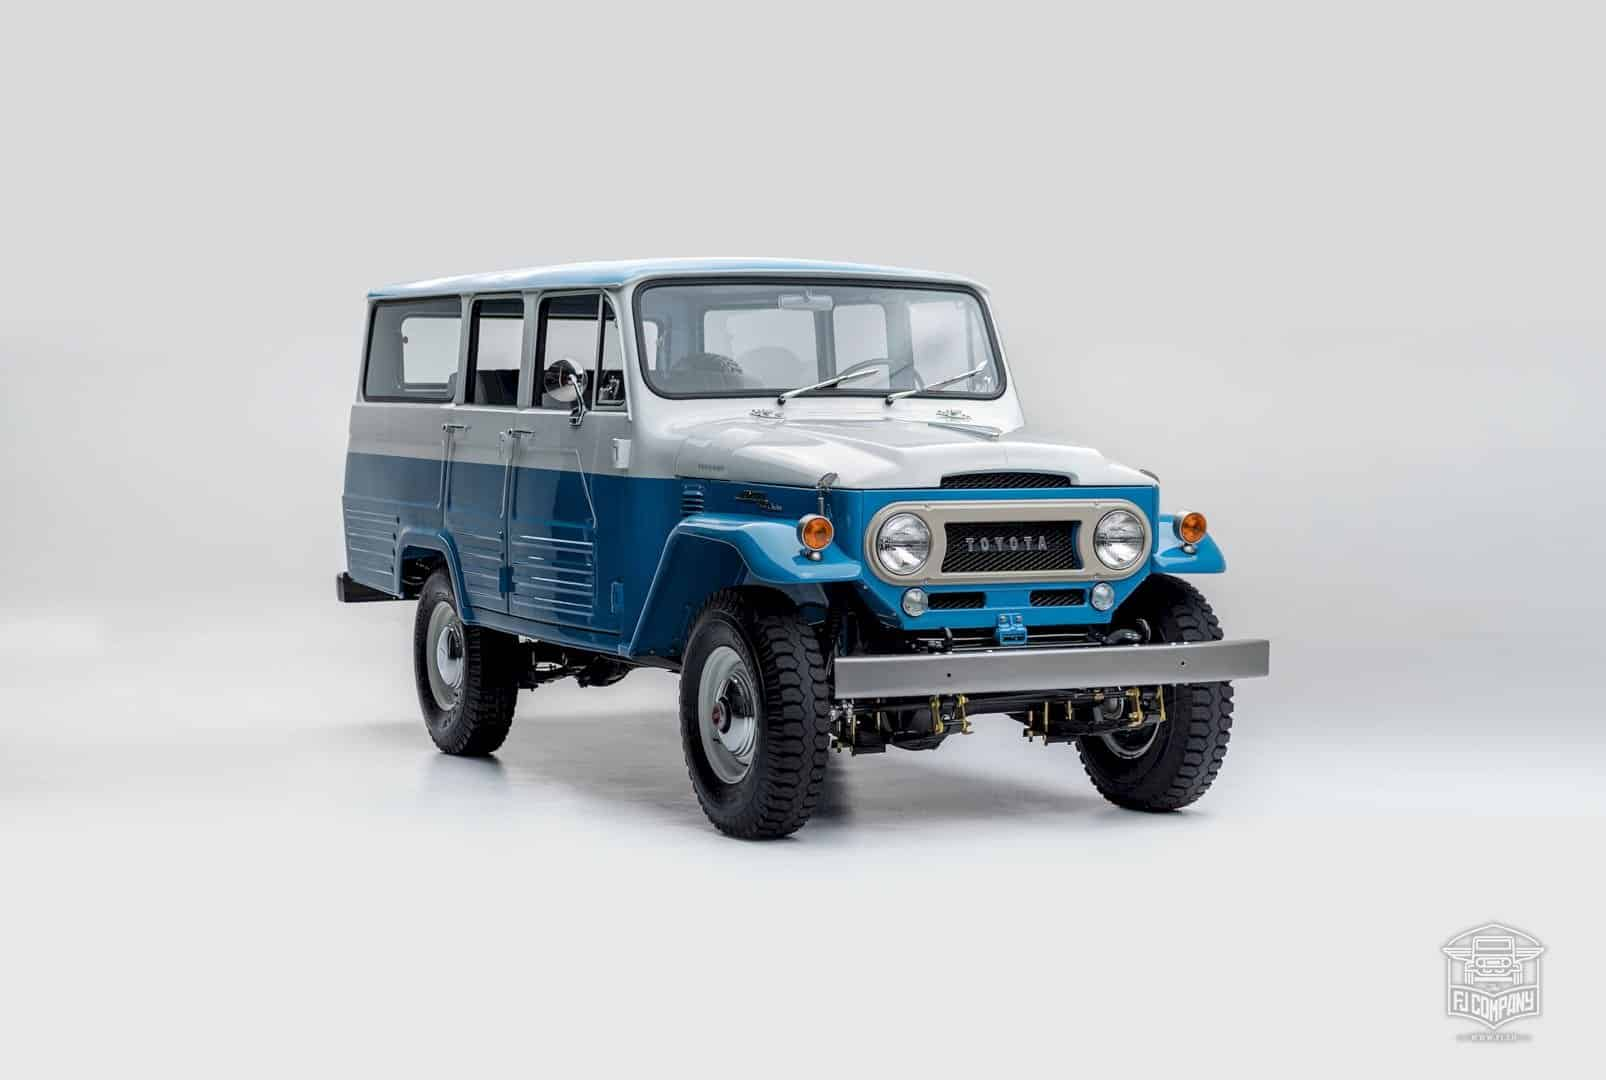 1967 Toyota Land Cruiser Fj45lv Capri Blue 8